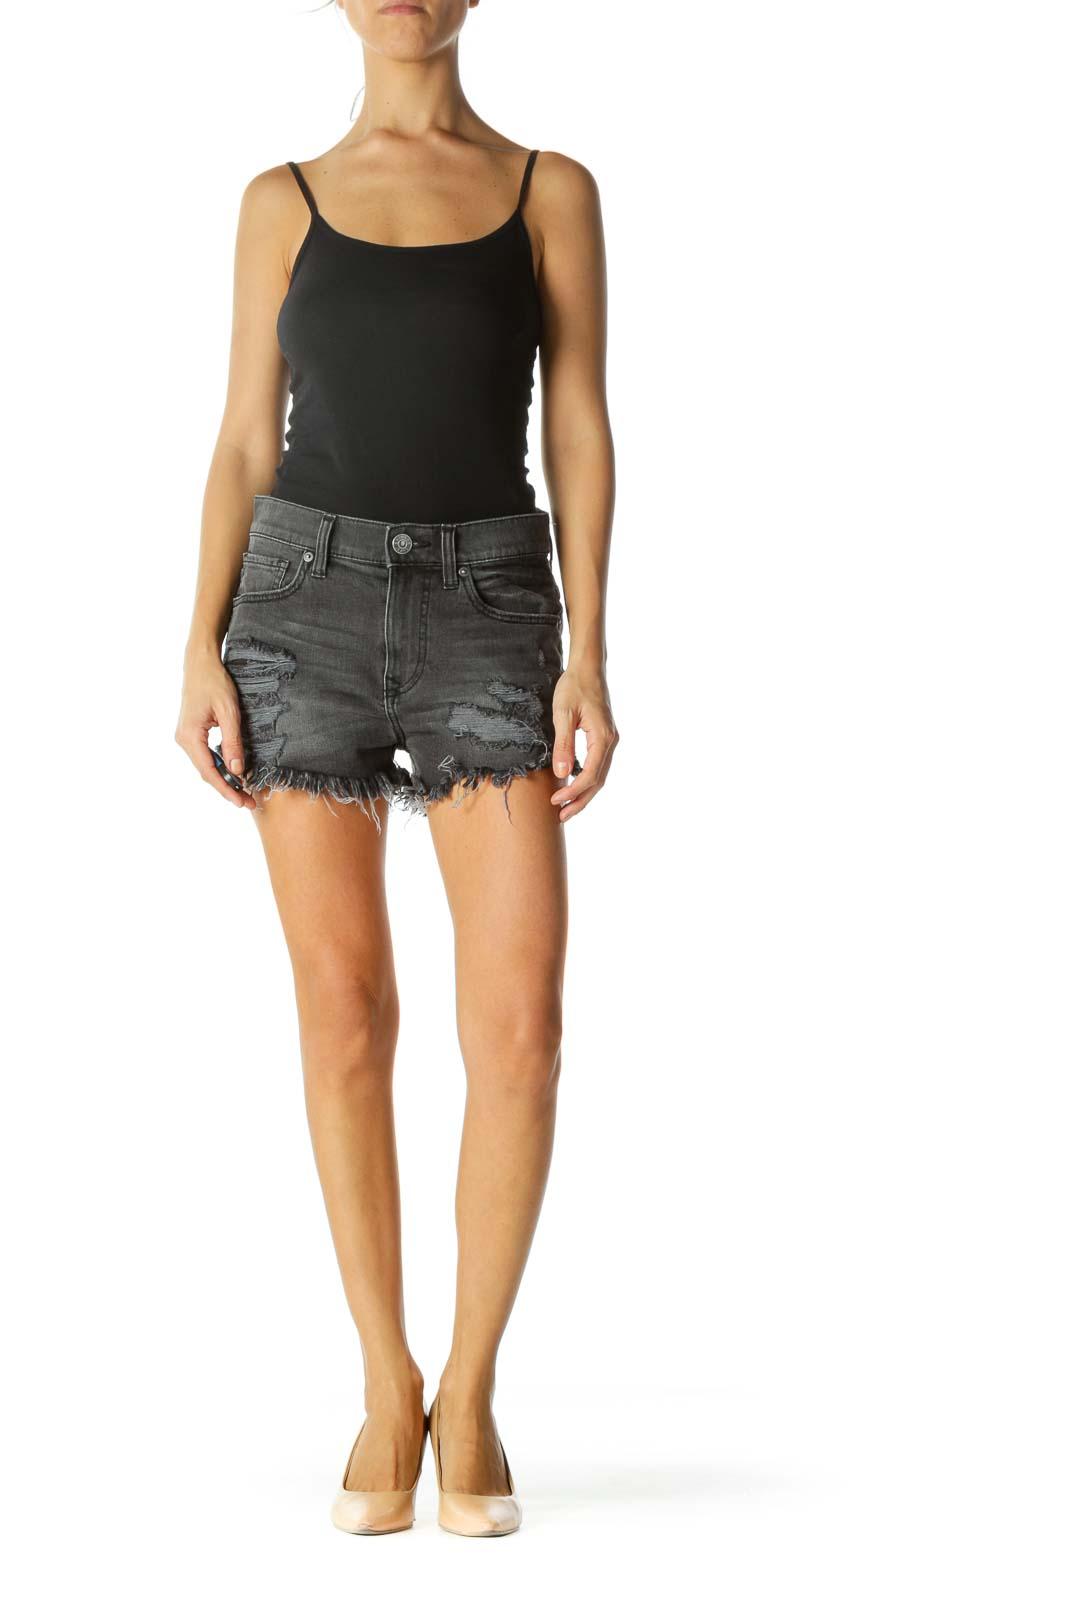 Faded Black Distressed Denim Shorts